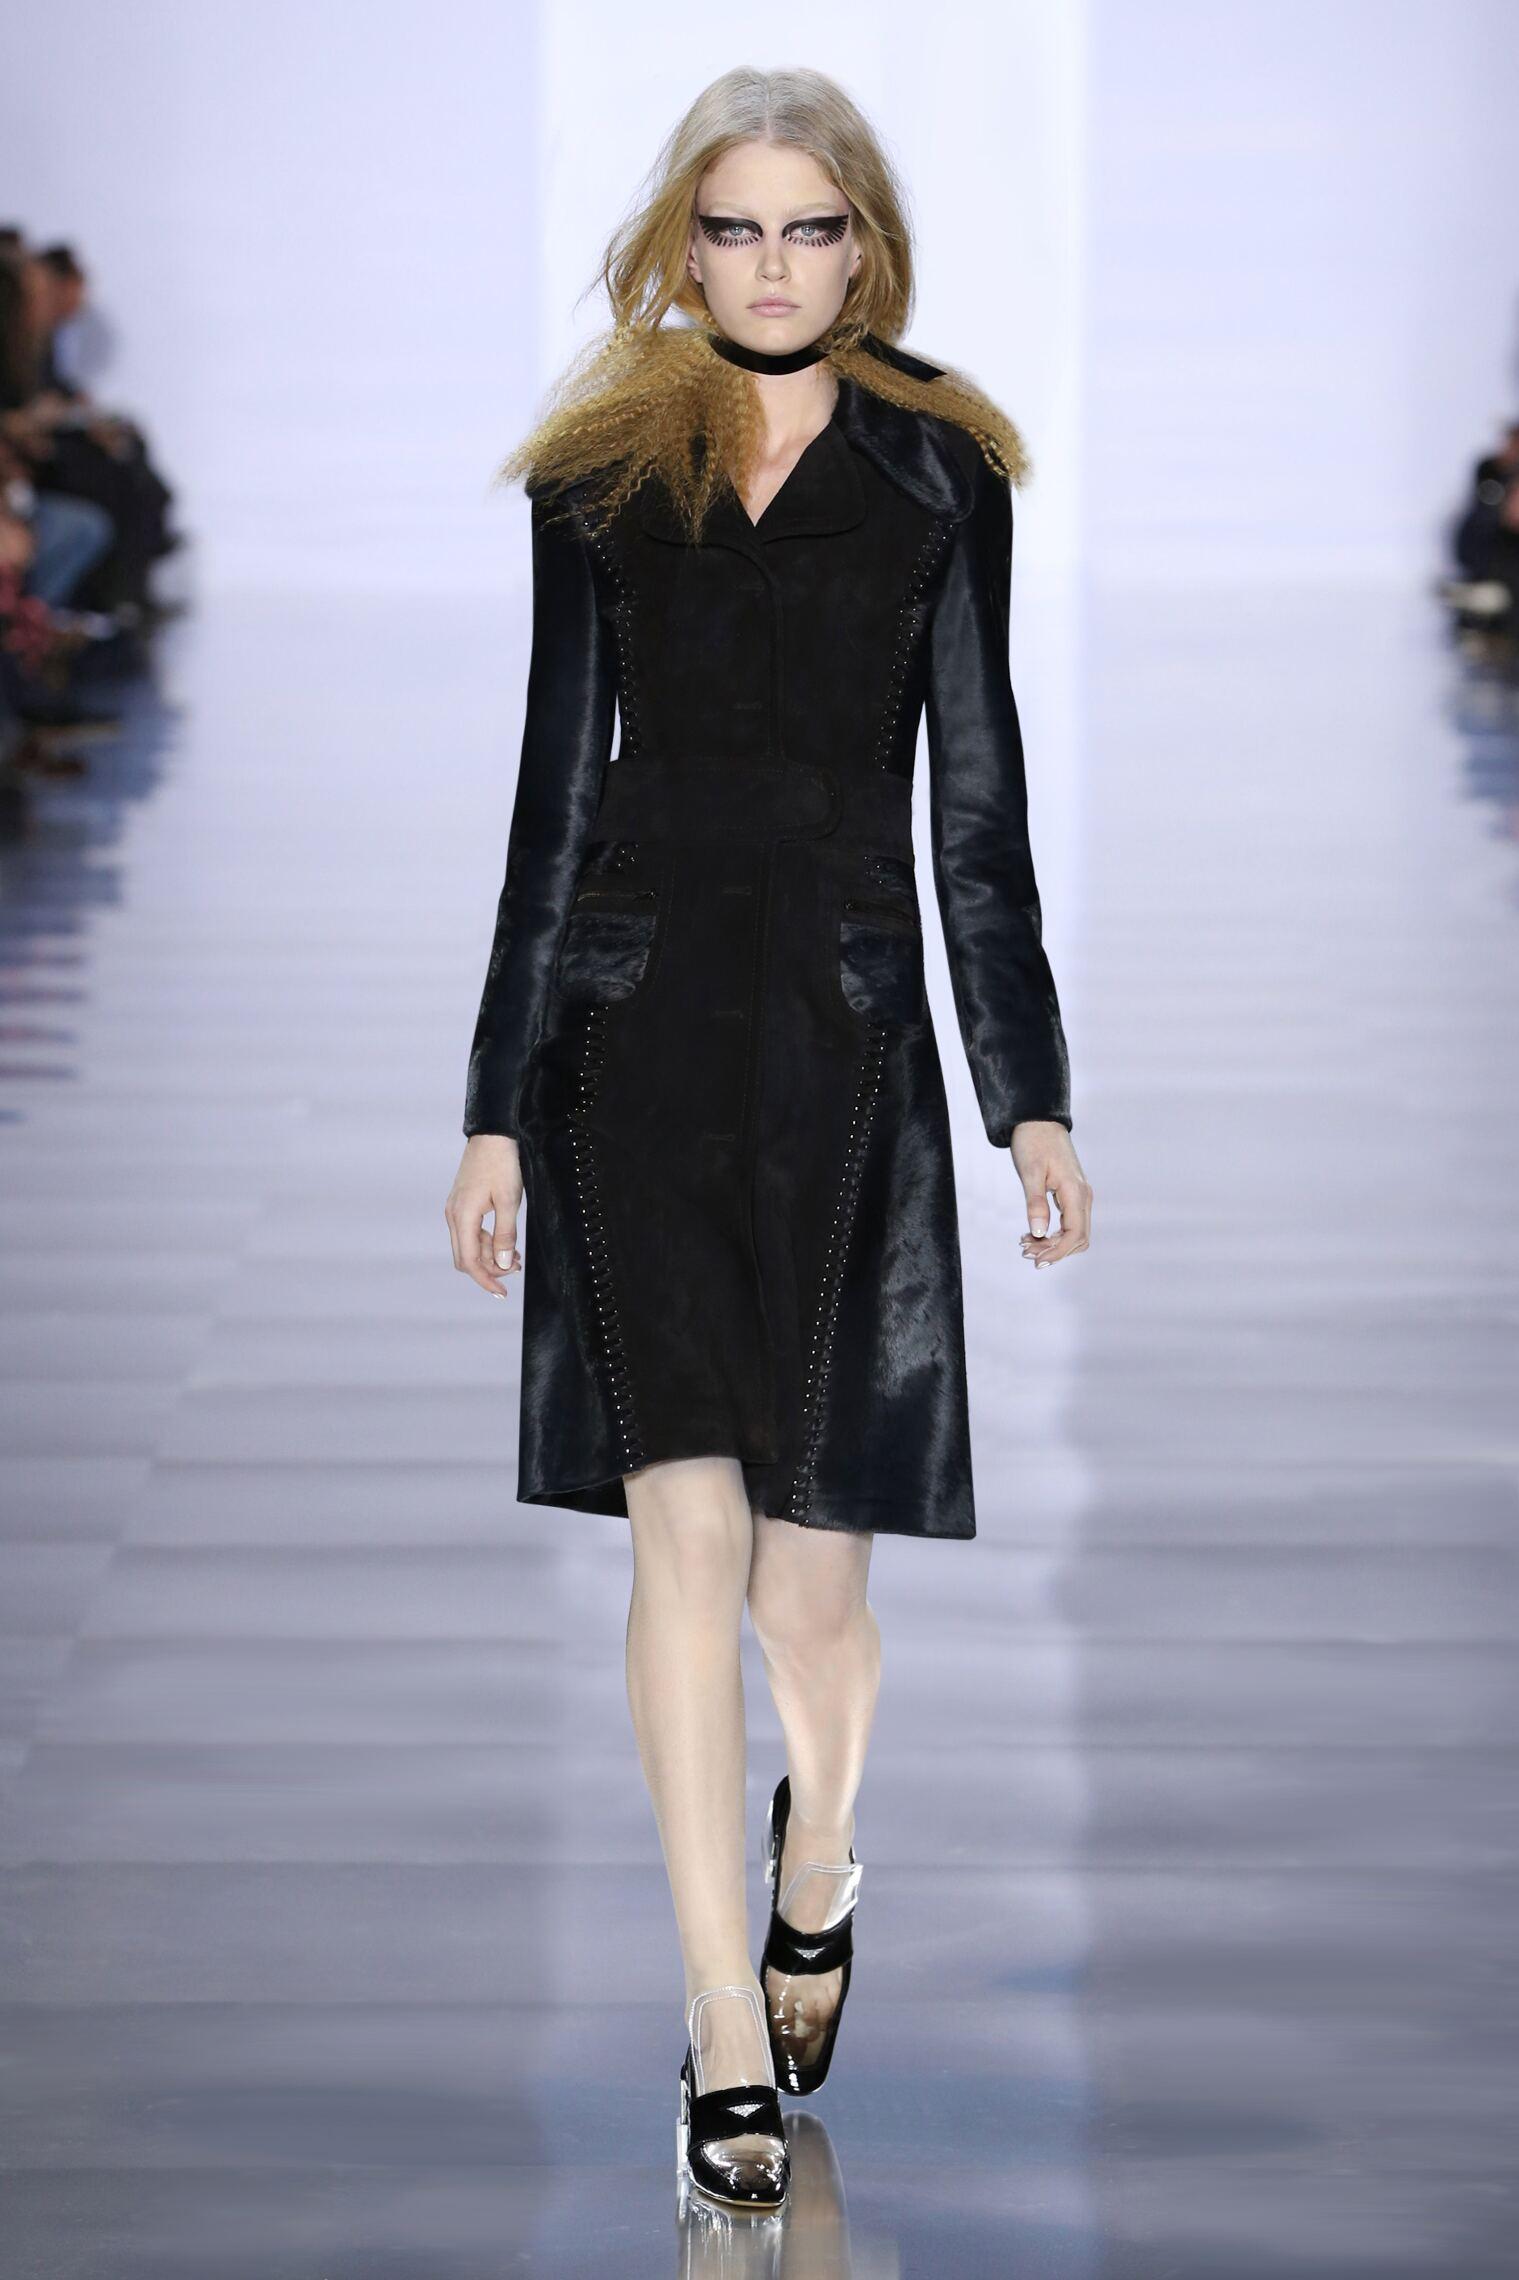 Catwalk Maison Margiela Womenswear Collection Winter 2015